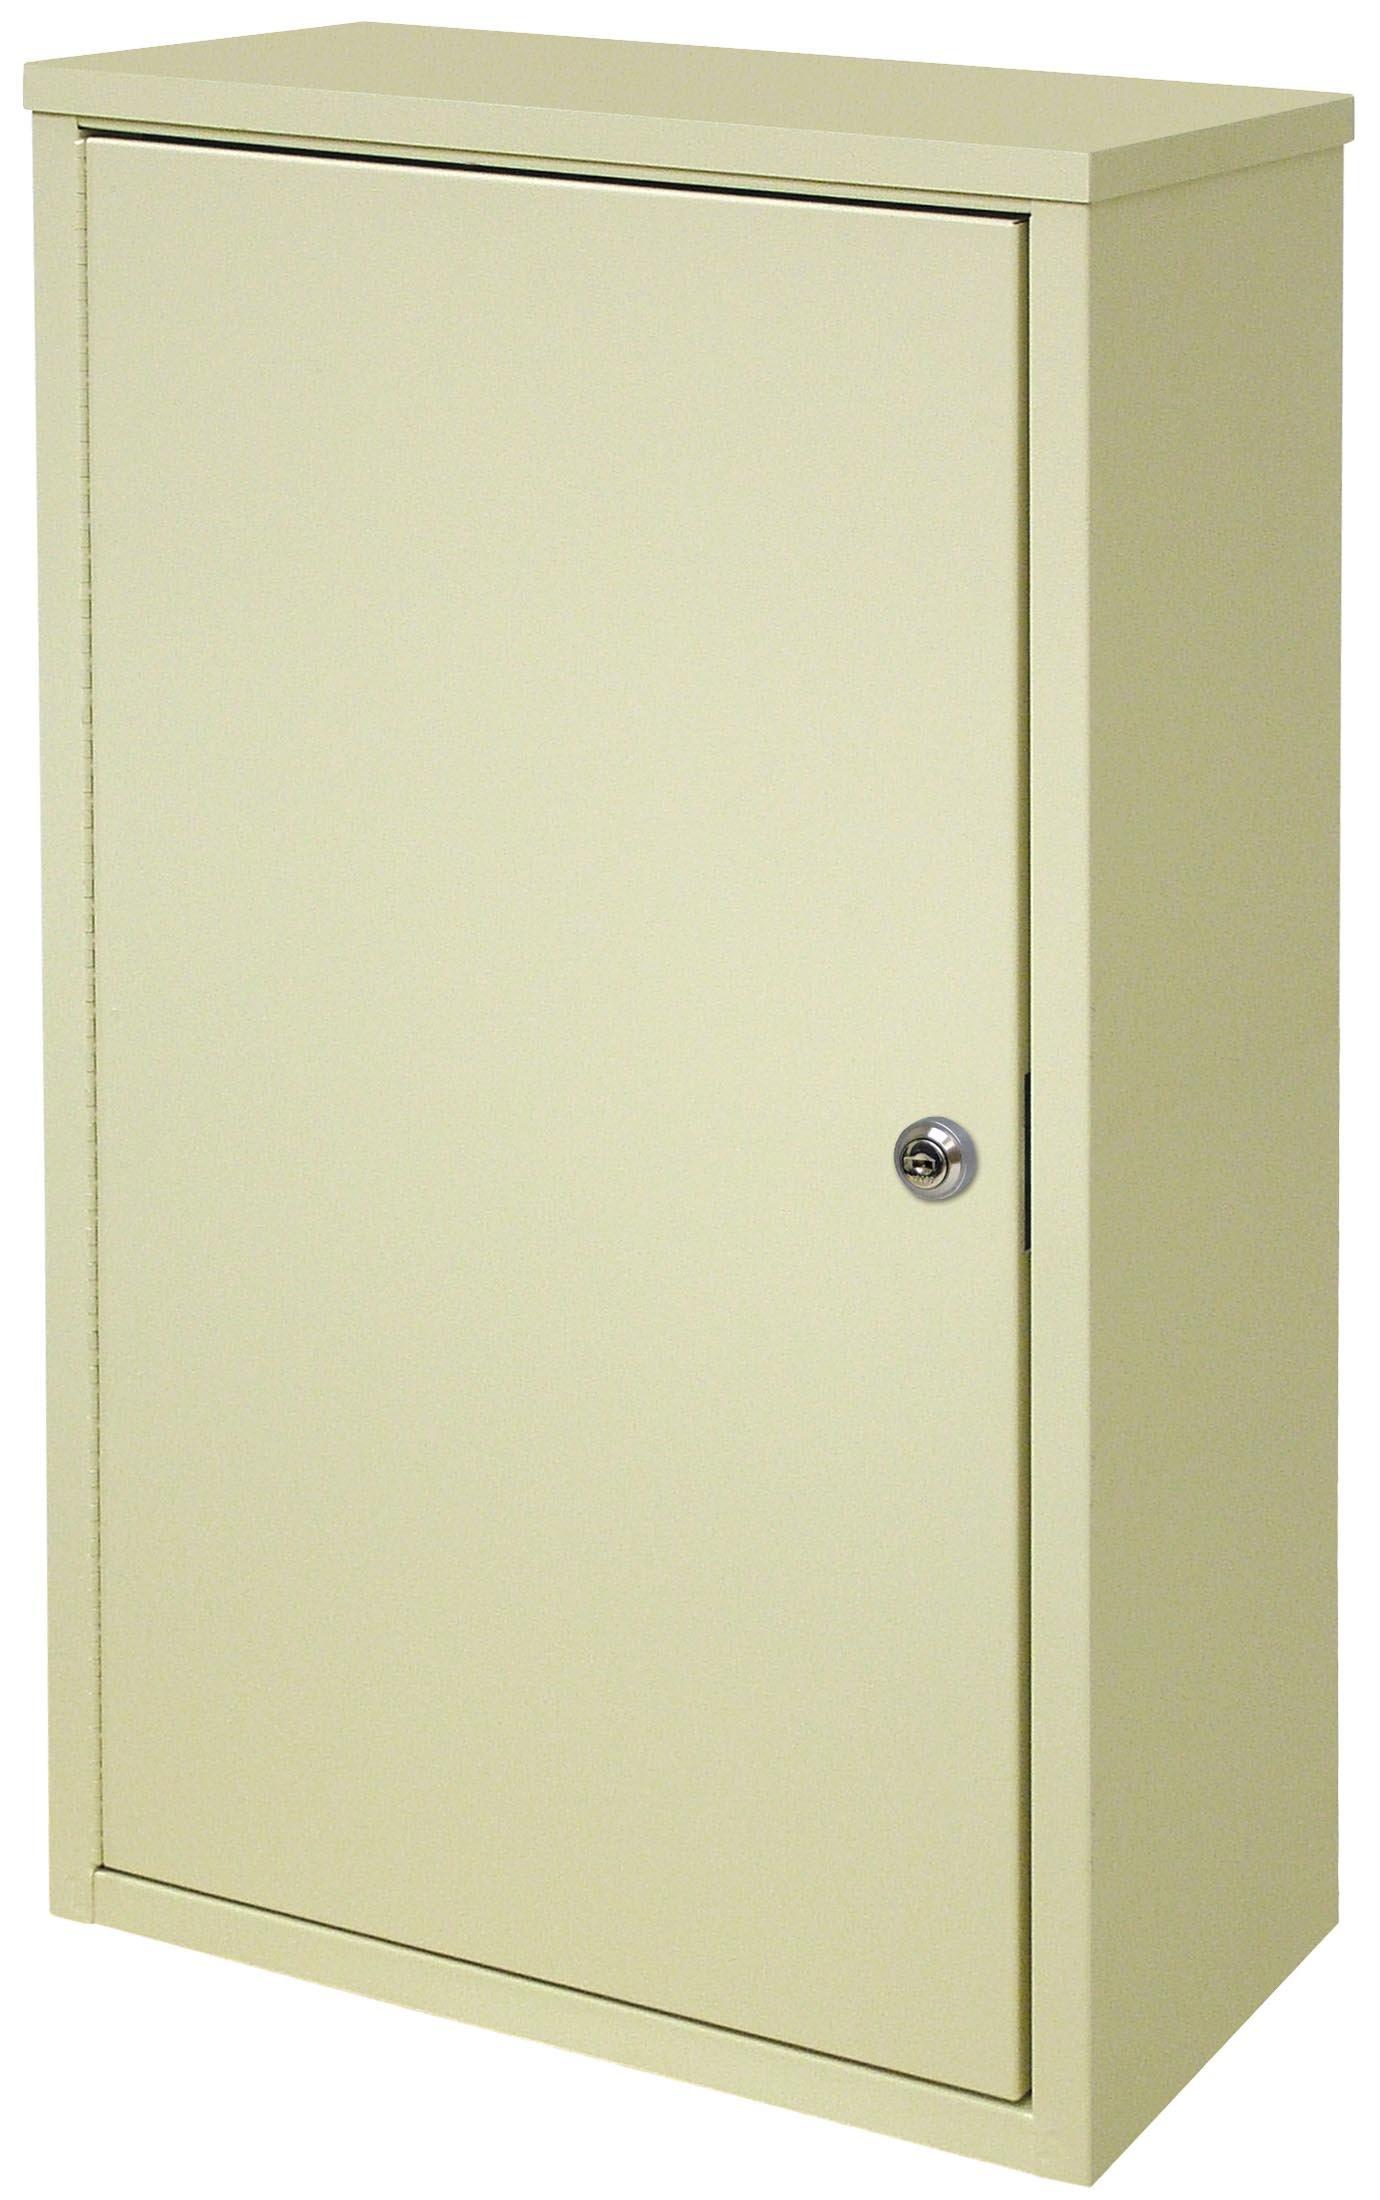 Large Wall Storage Cabinet - Beige